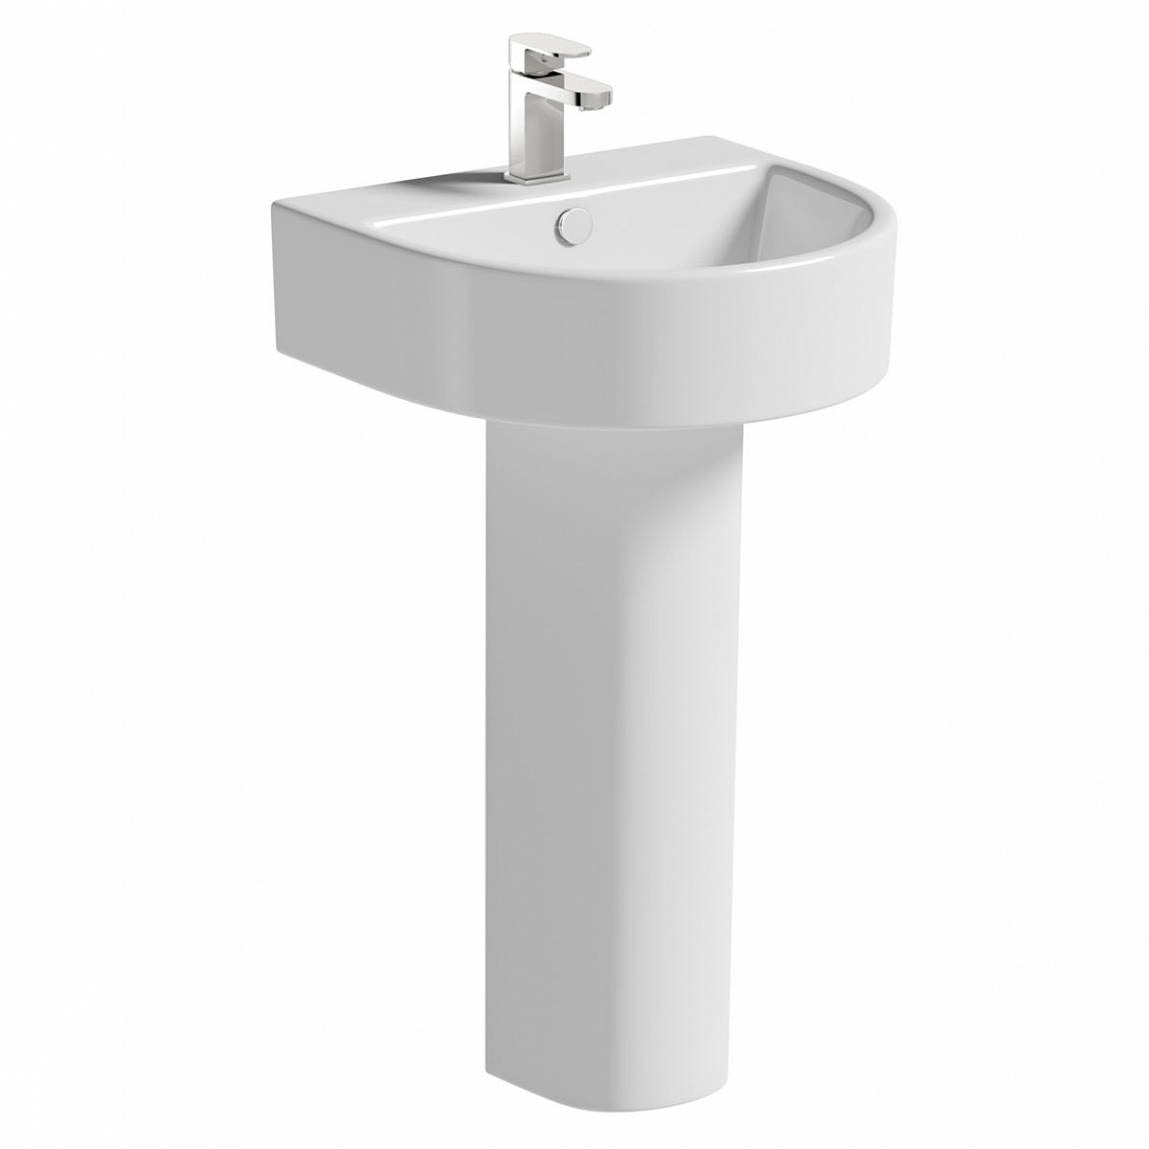 Orchard Dee 1 tap hole full pedestal basin 510mm